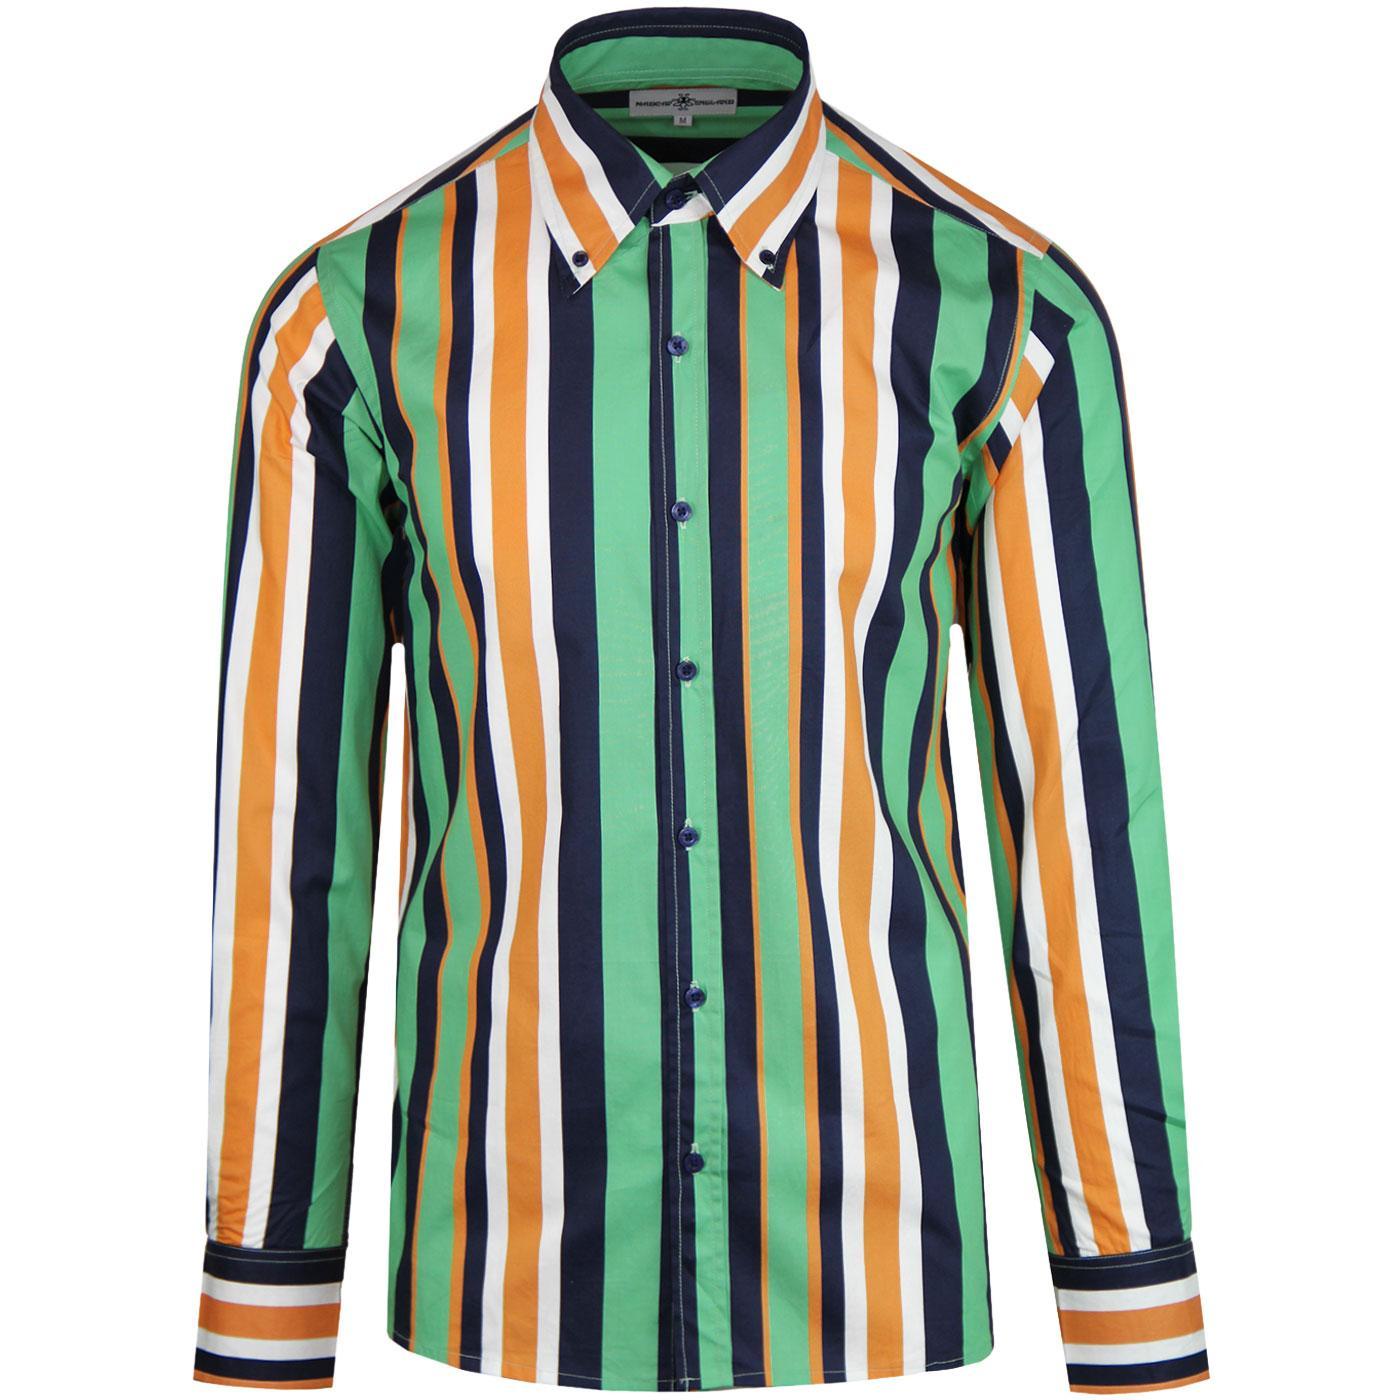 Madcap England Trip Retro 60s Mod Stripe Button Down Shirt in Green